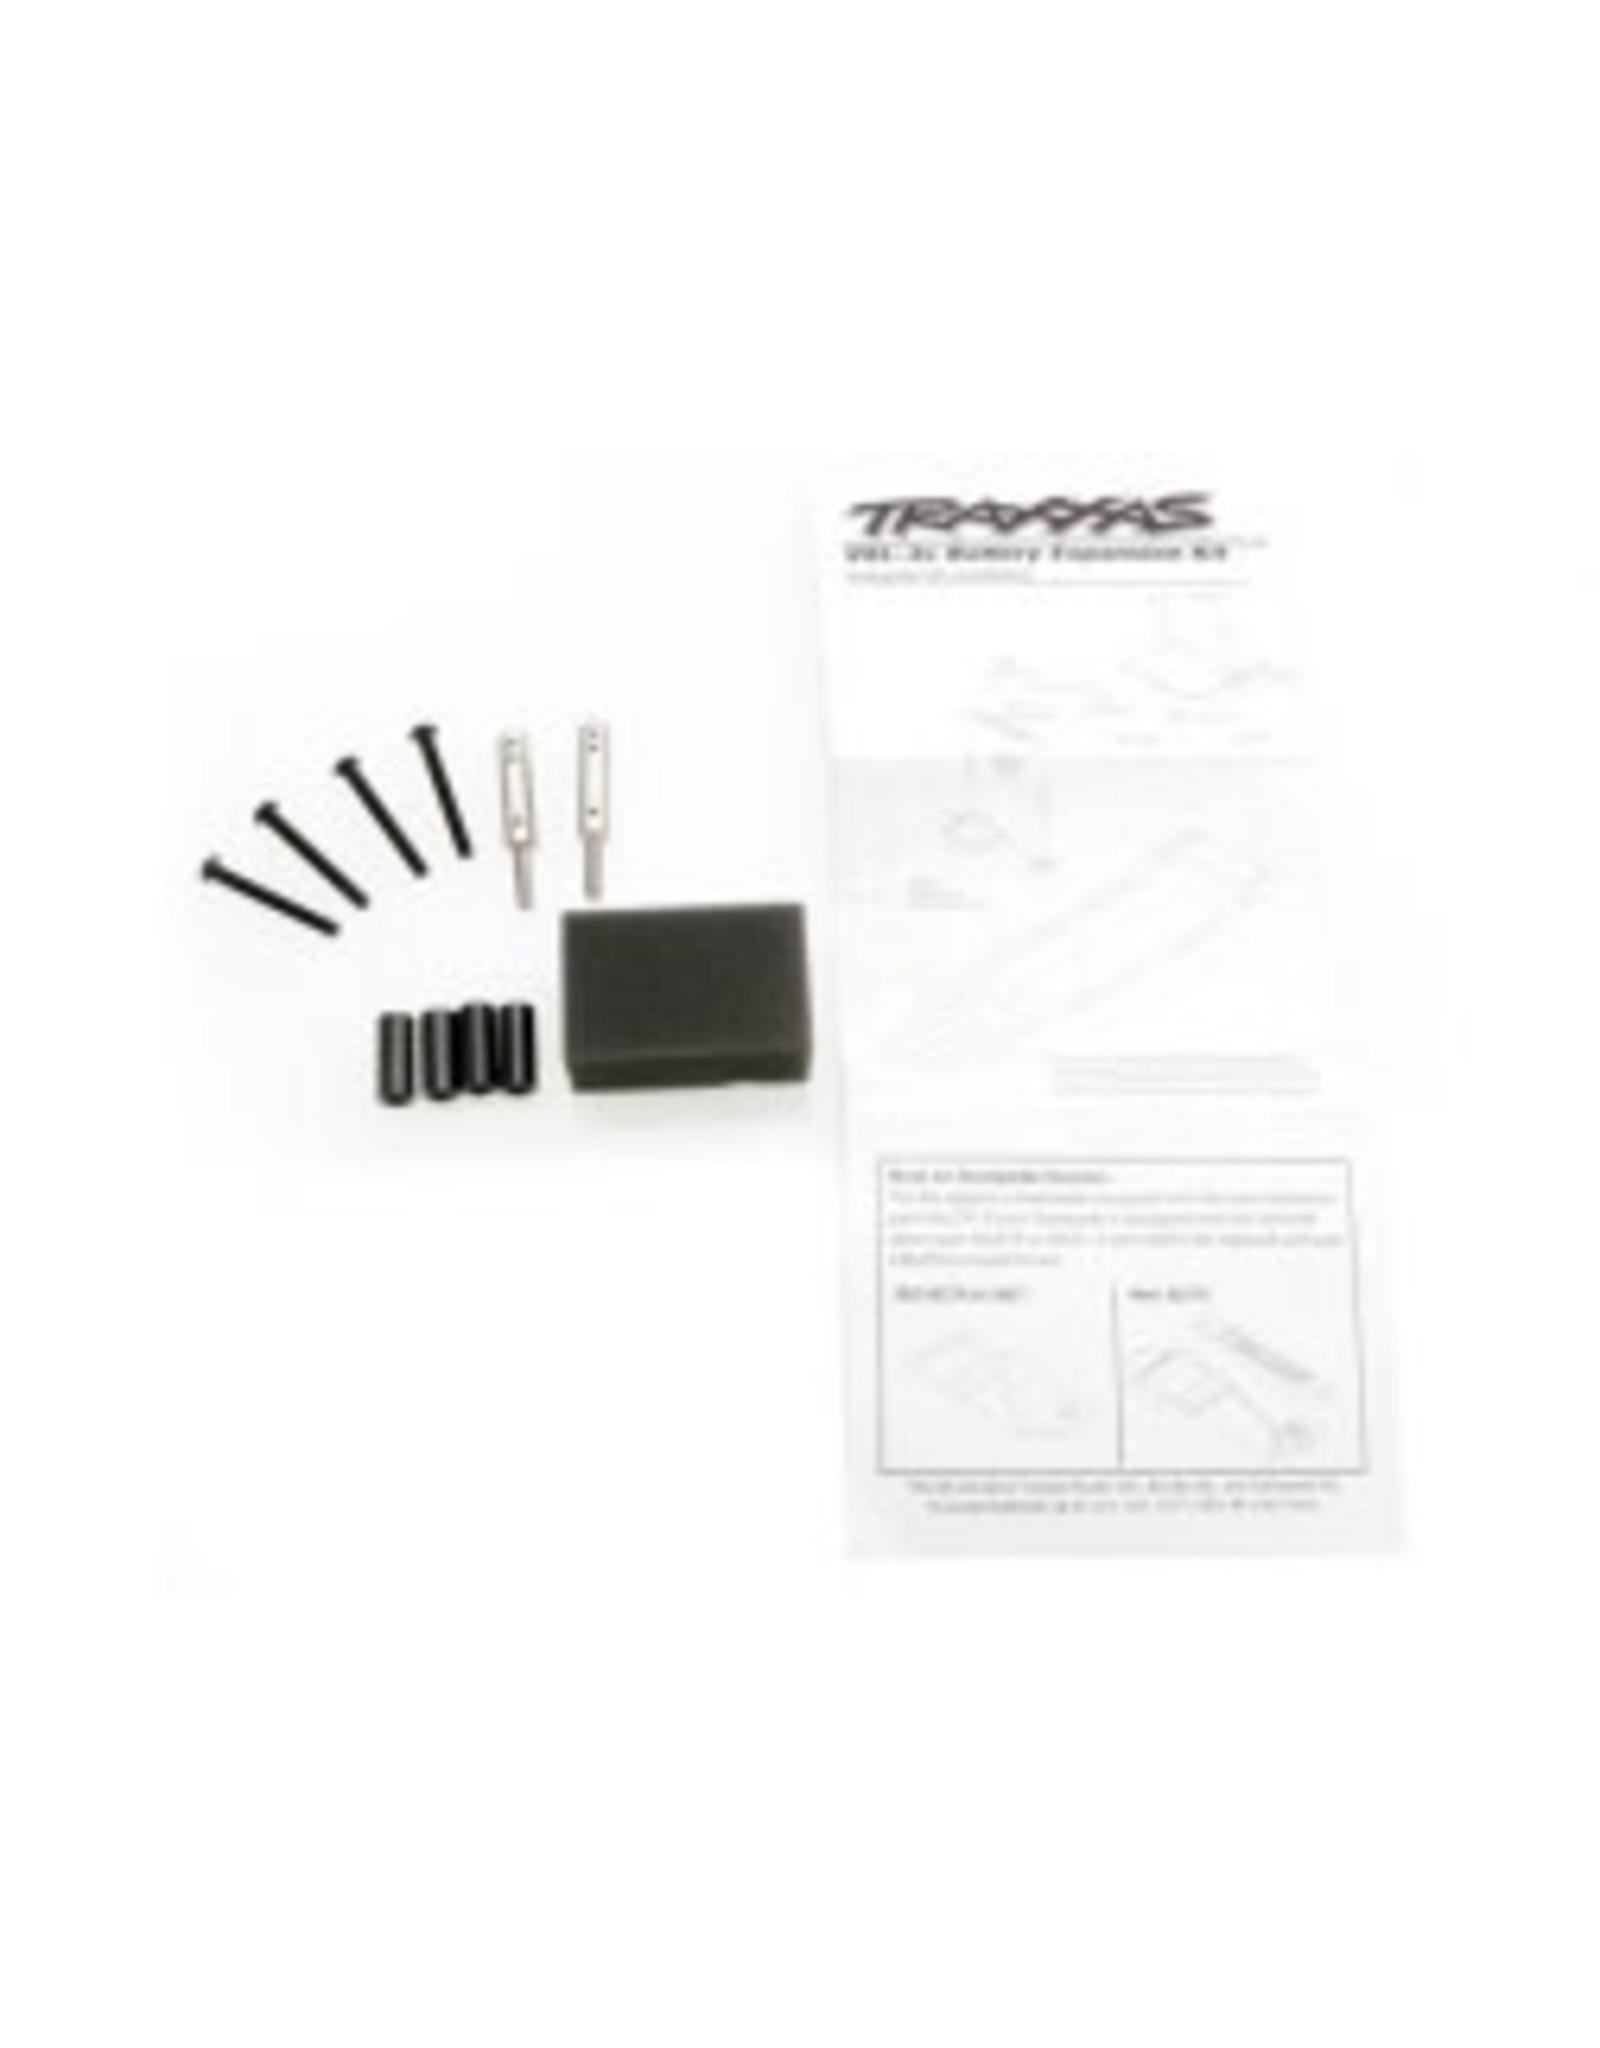 Traxxas Battery Expansion Kit: RU, BA, ST  (TRA3725X)